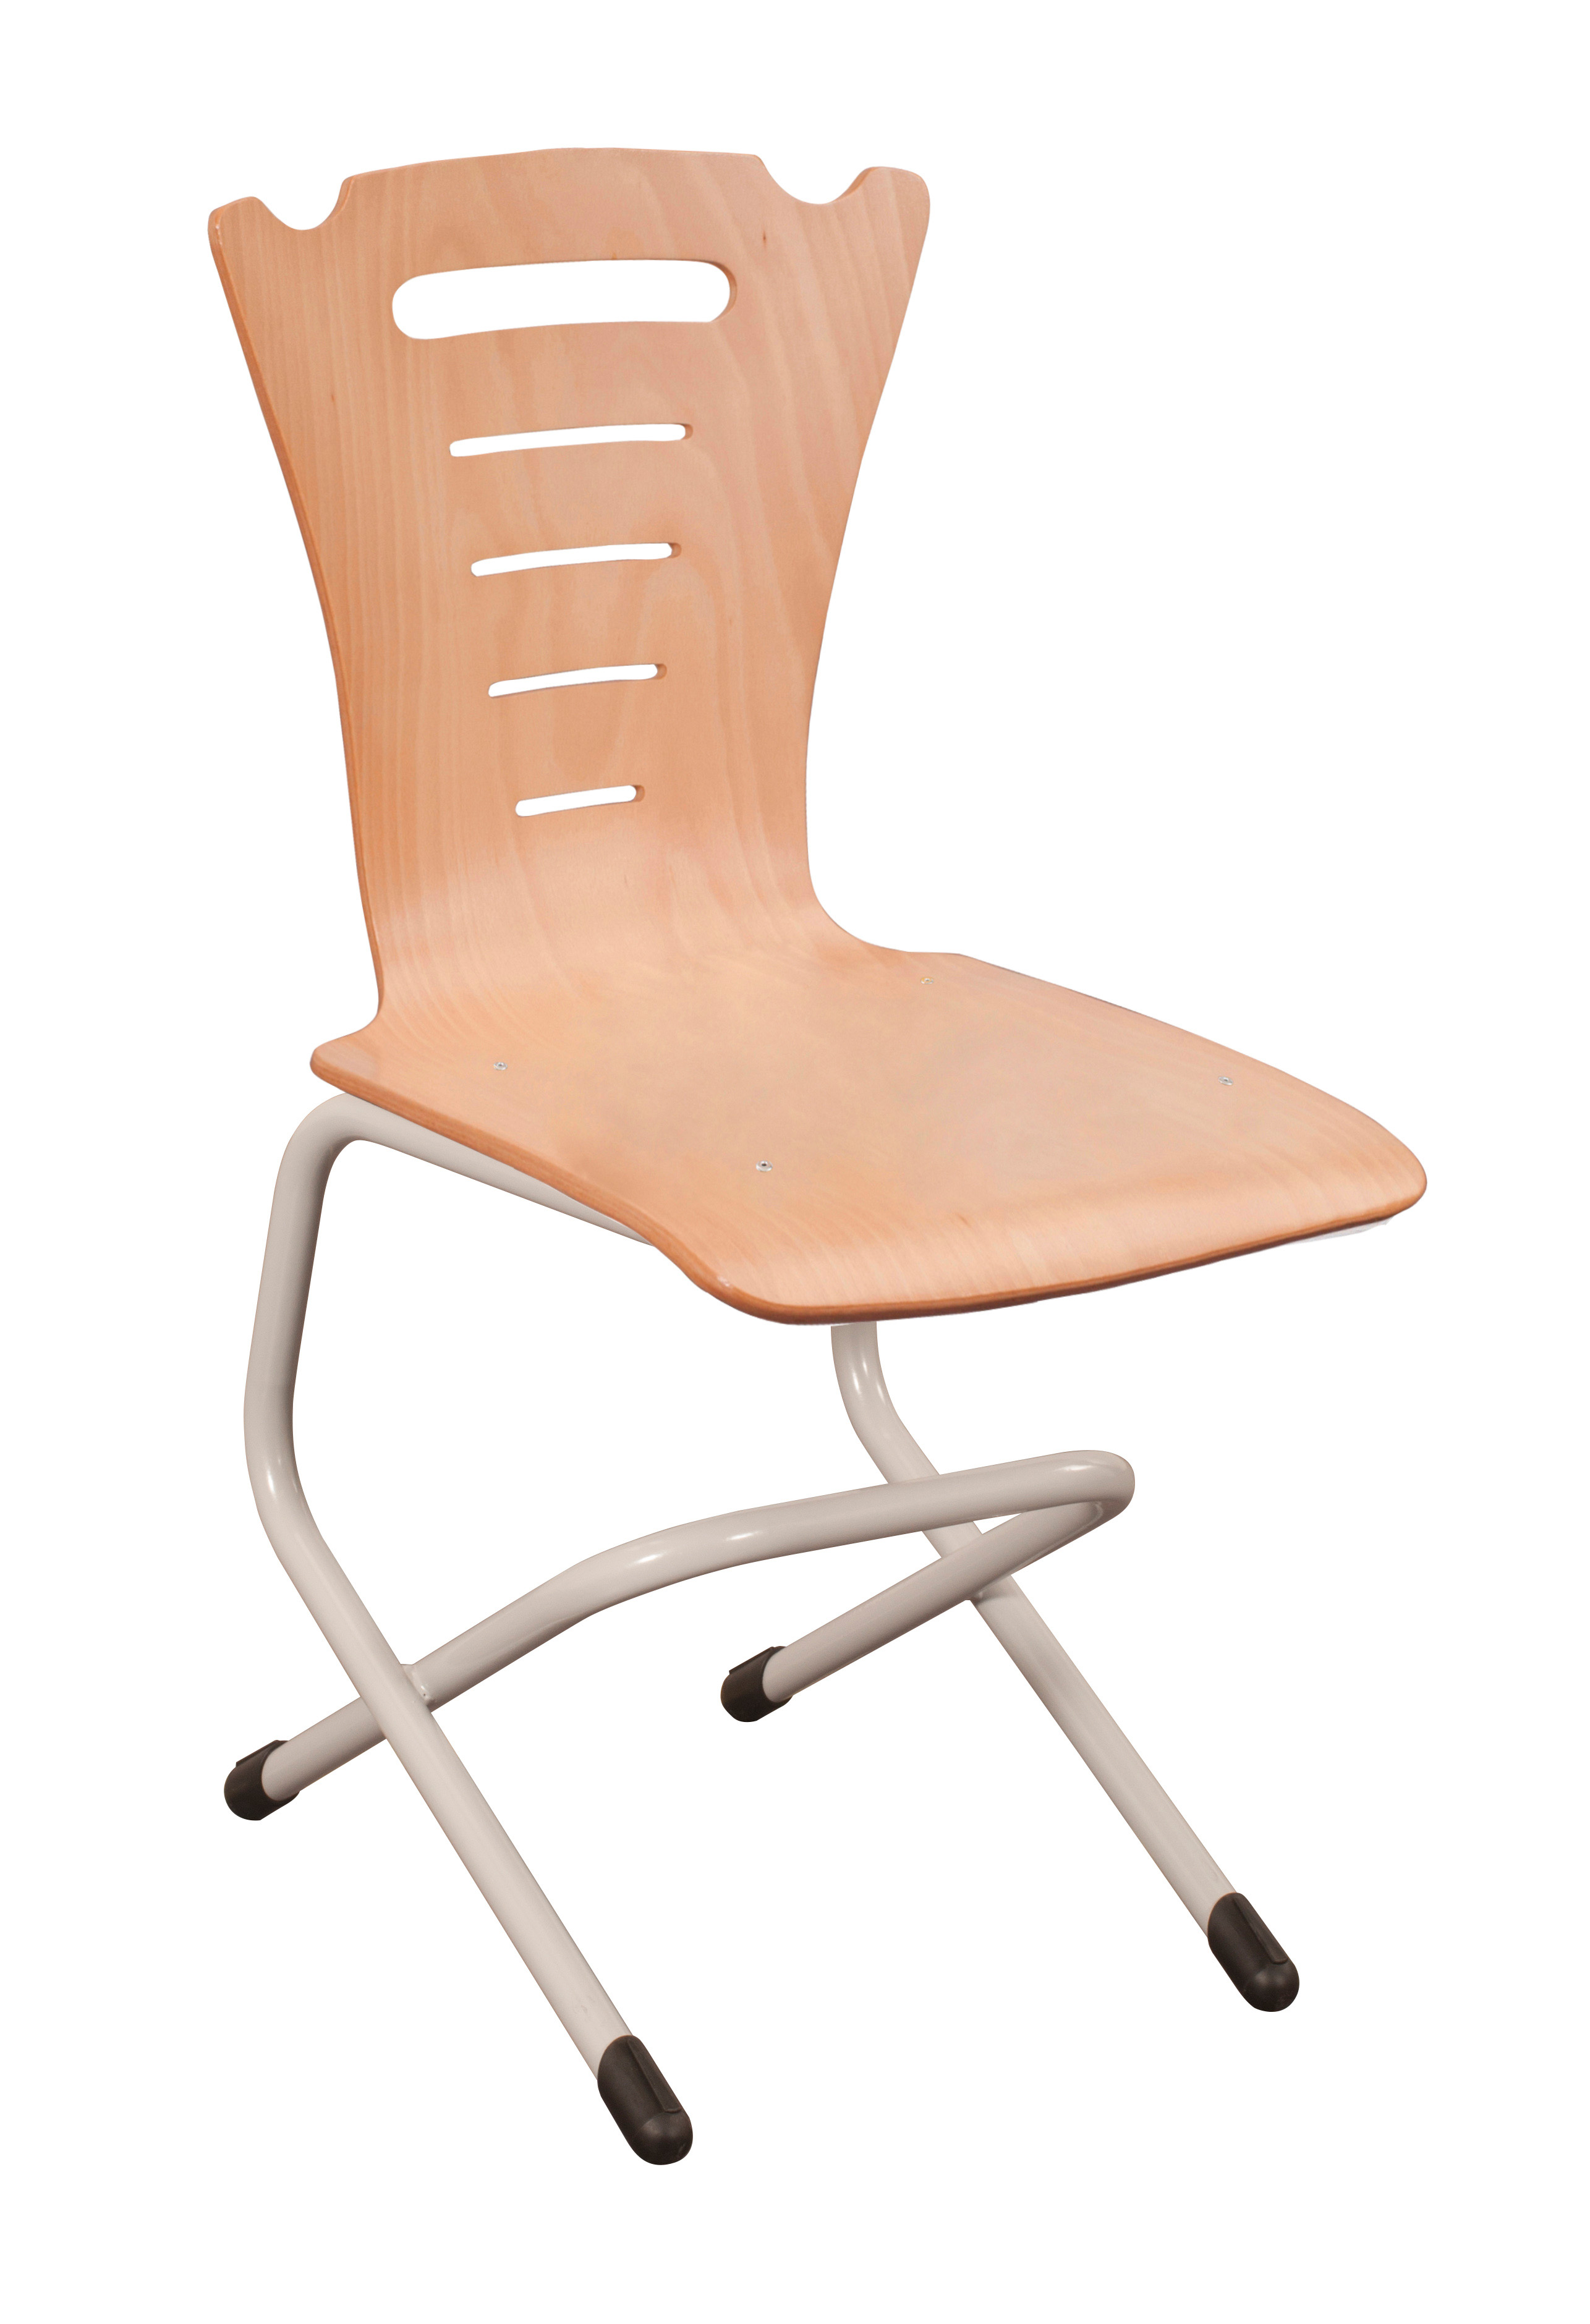 chaise coque bois double ast simire. Black Bedroom Furniture Sets. Home Design Ideas